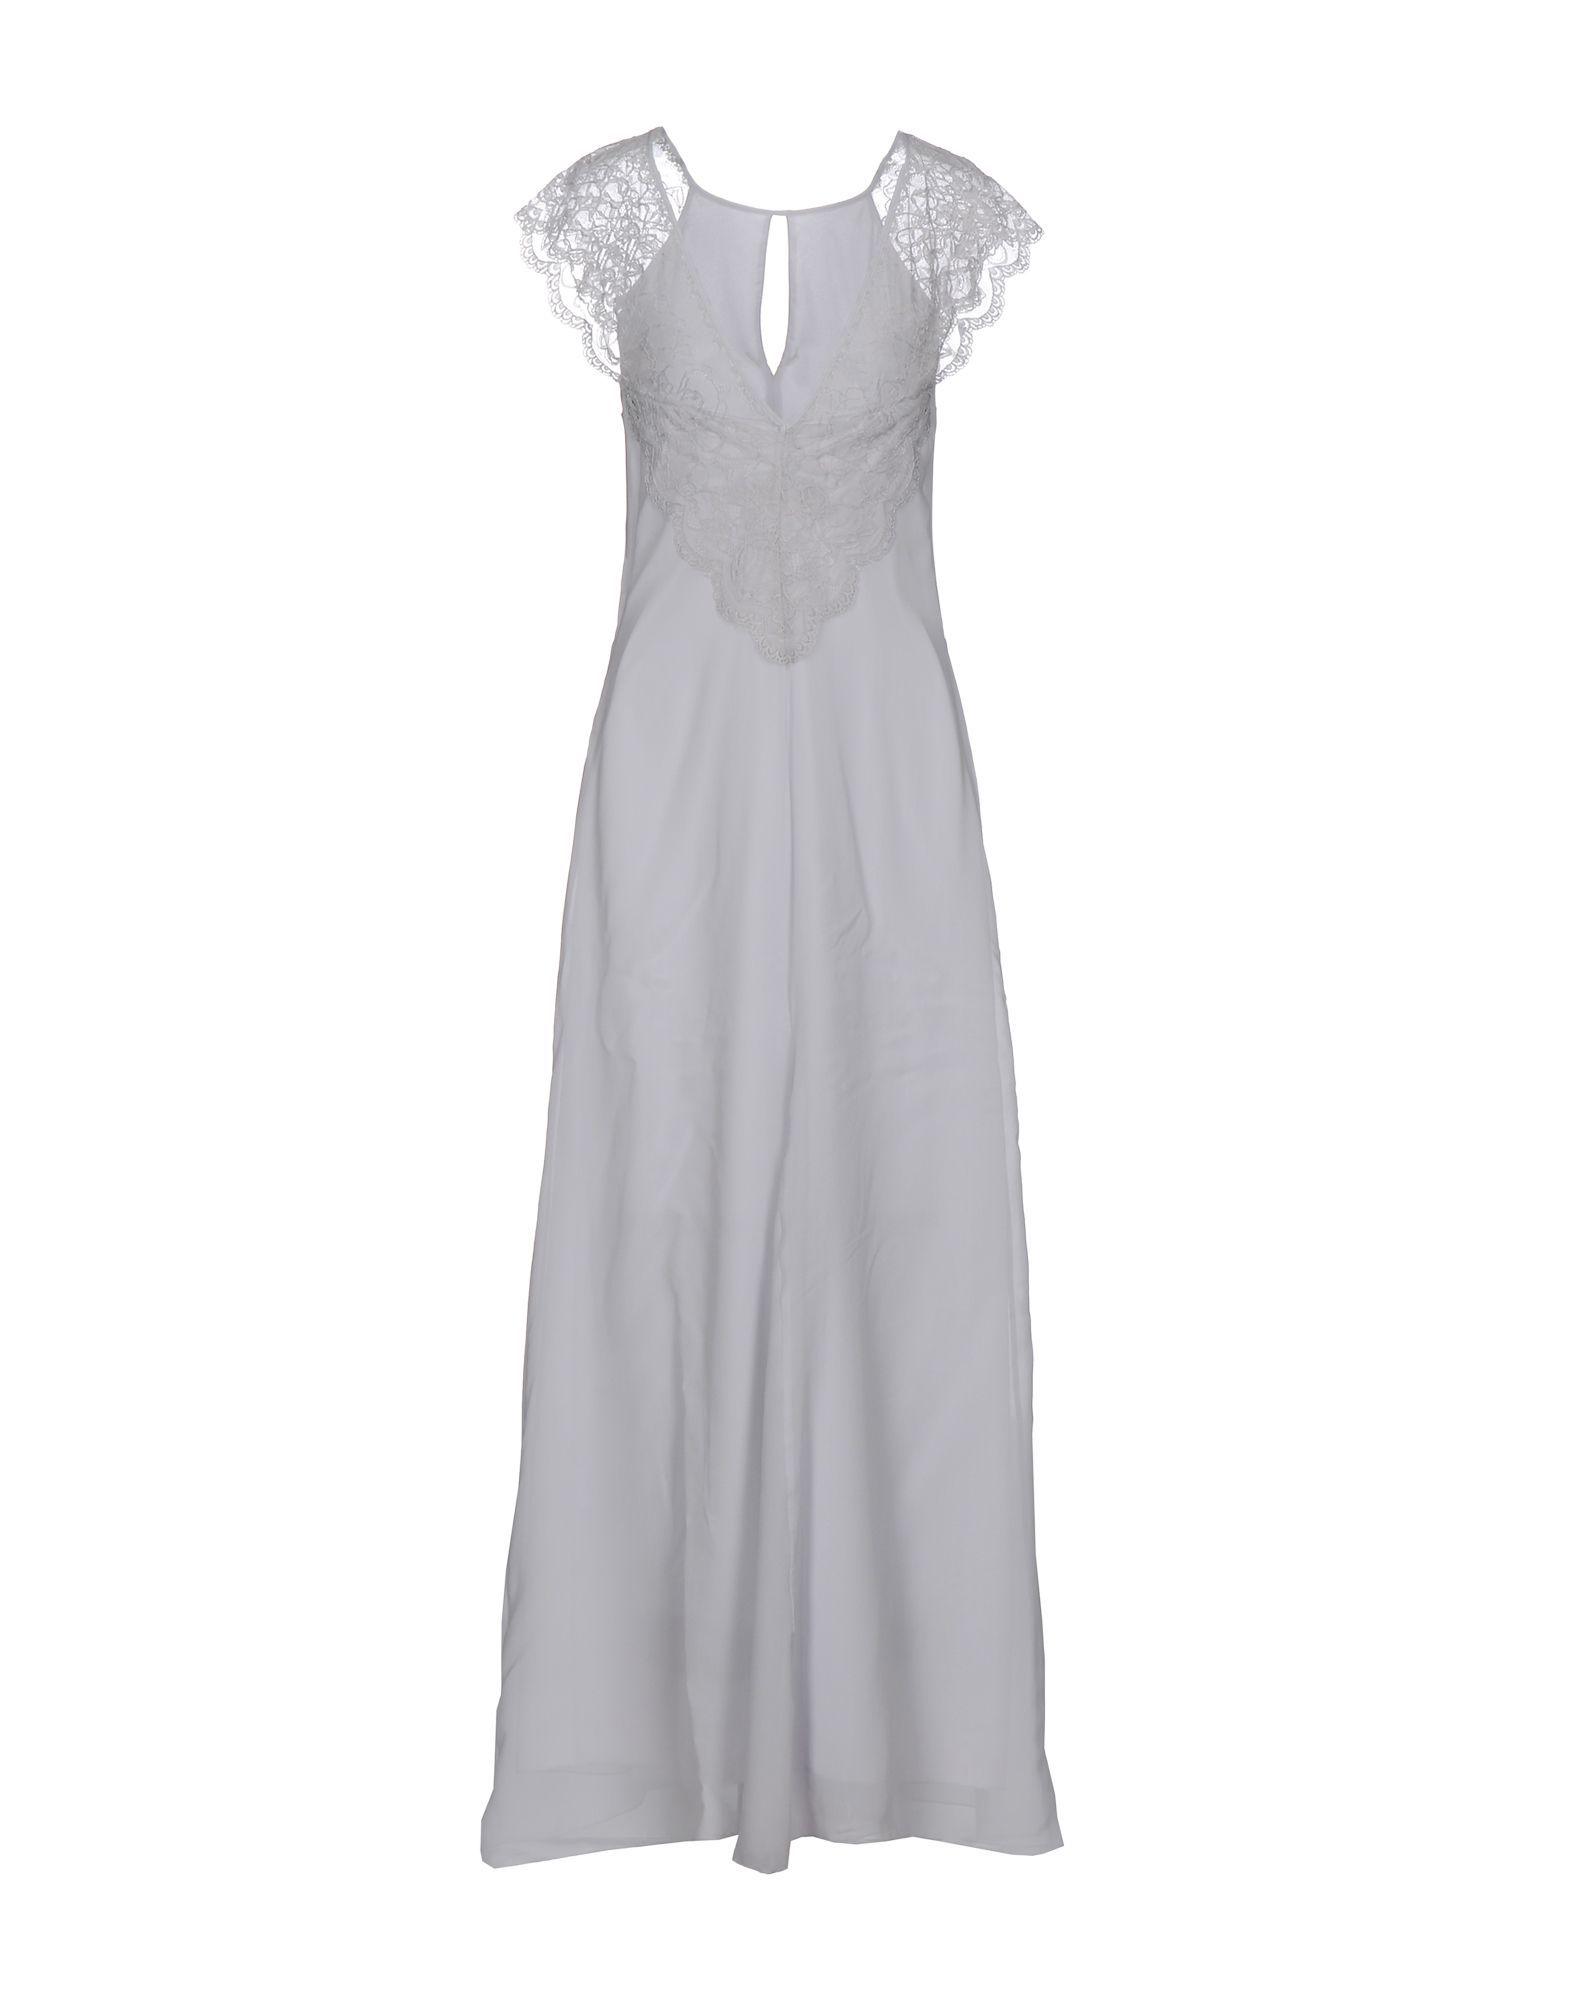 Patrizia Pepe Sera Light Grey Silk Full Length Dress With Lace Detail